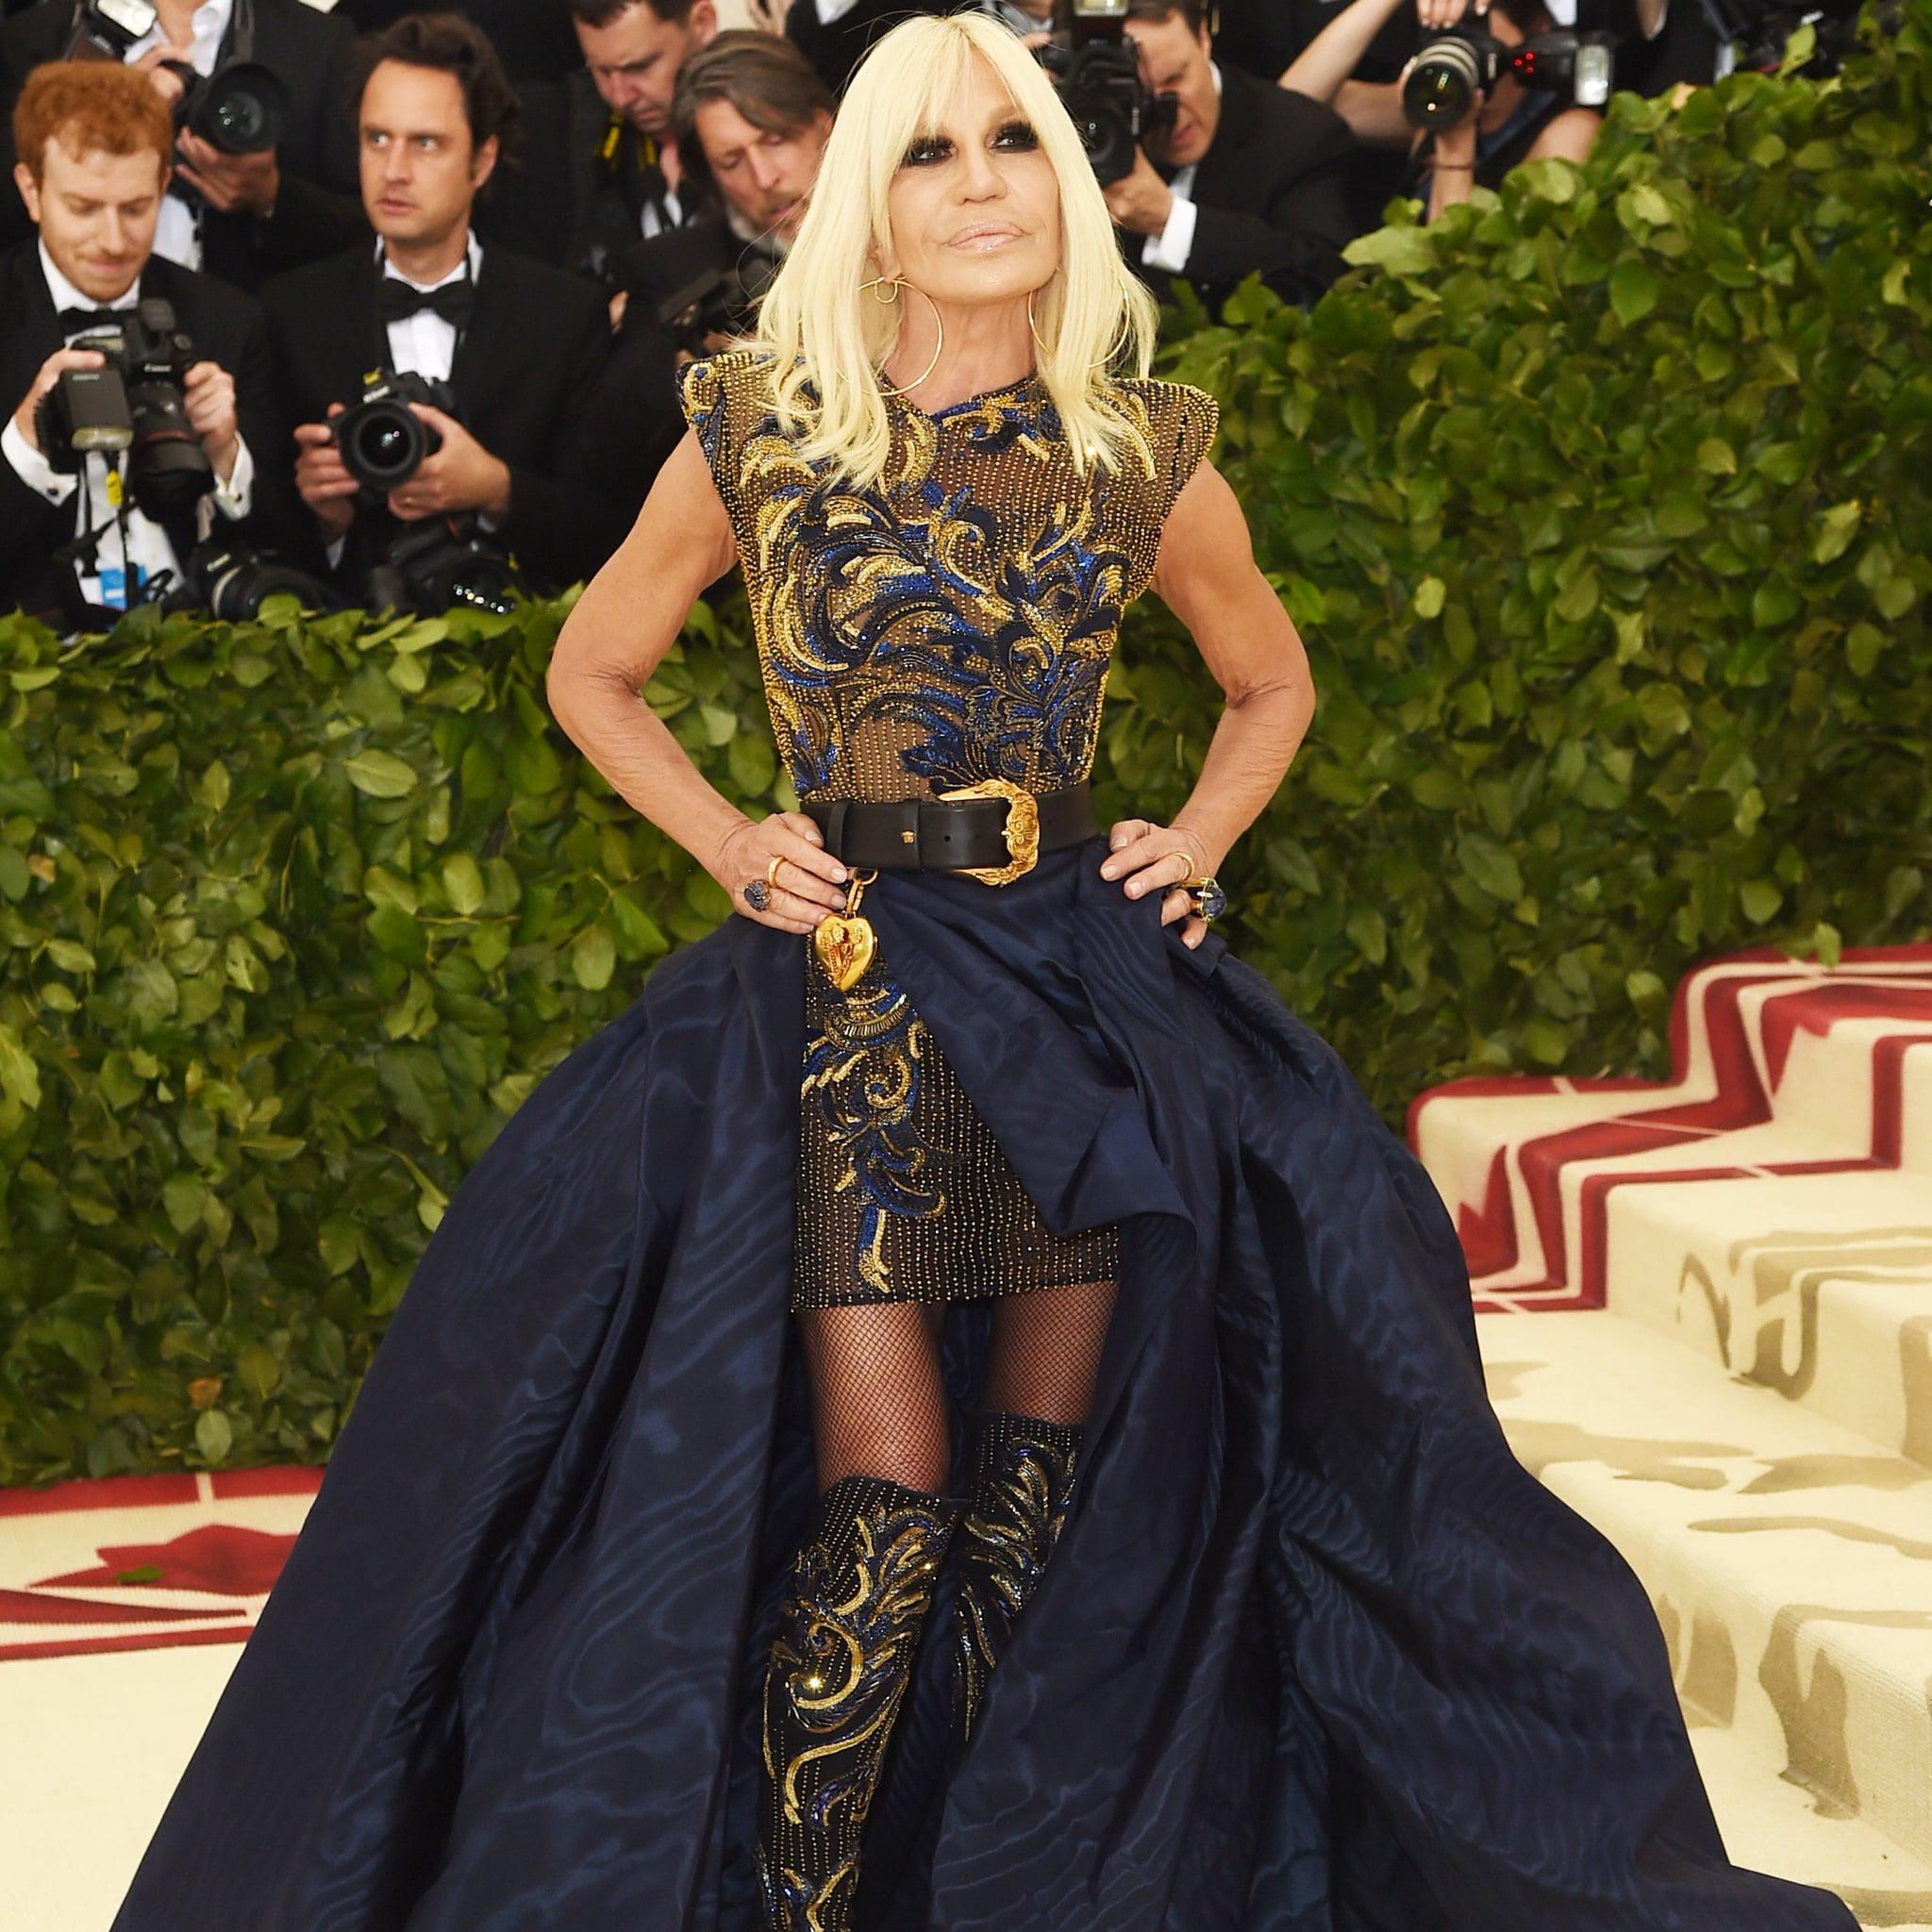 52d4558a91d4 Donatella Versace Met Gala Dress 2018